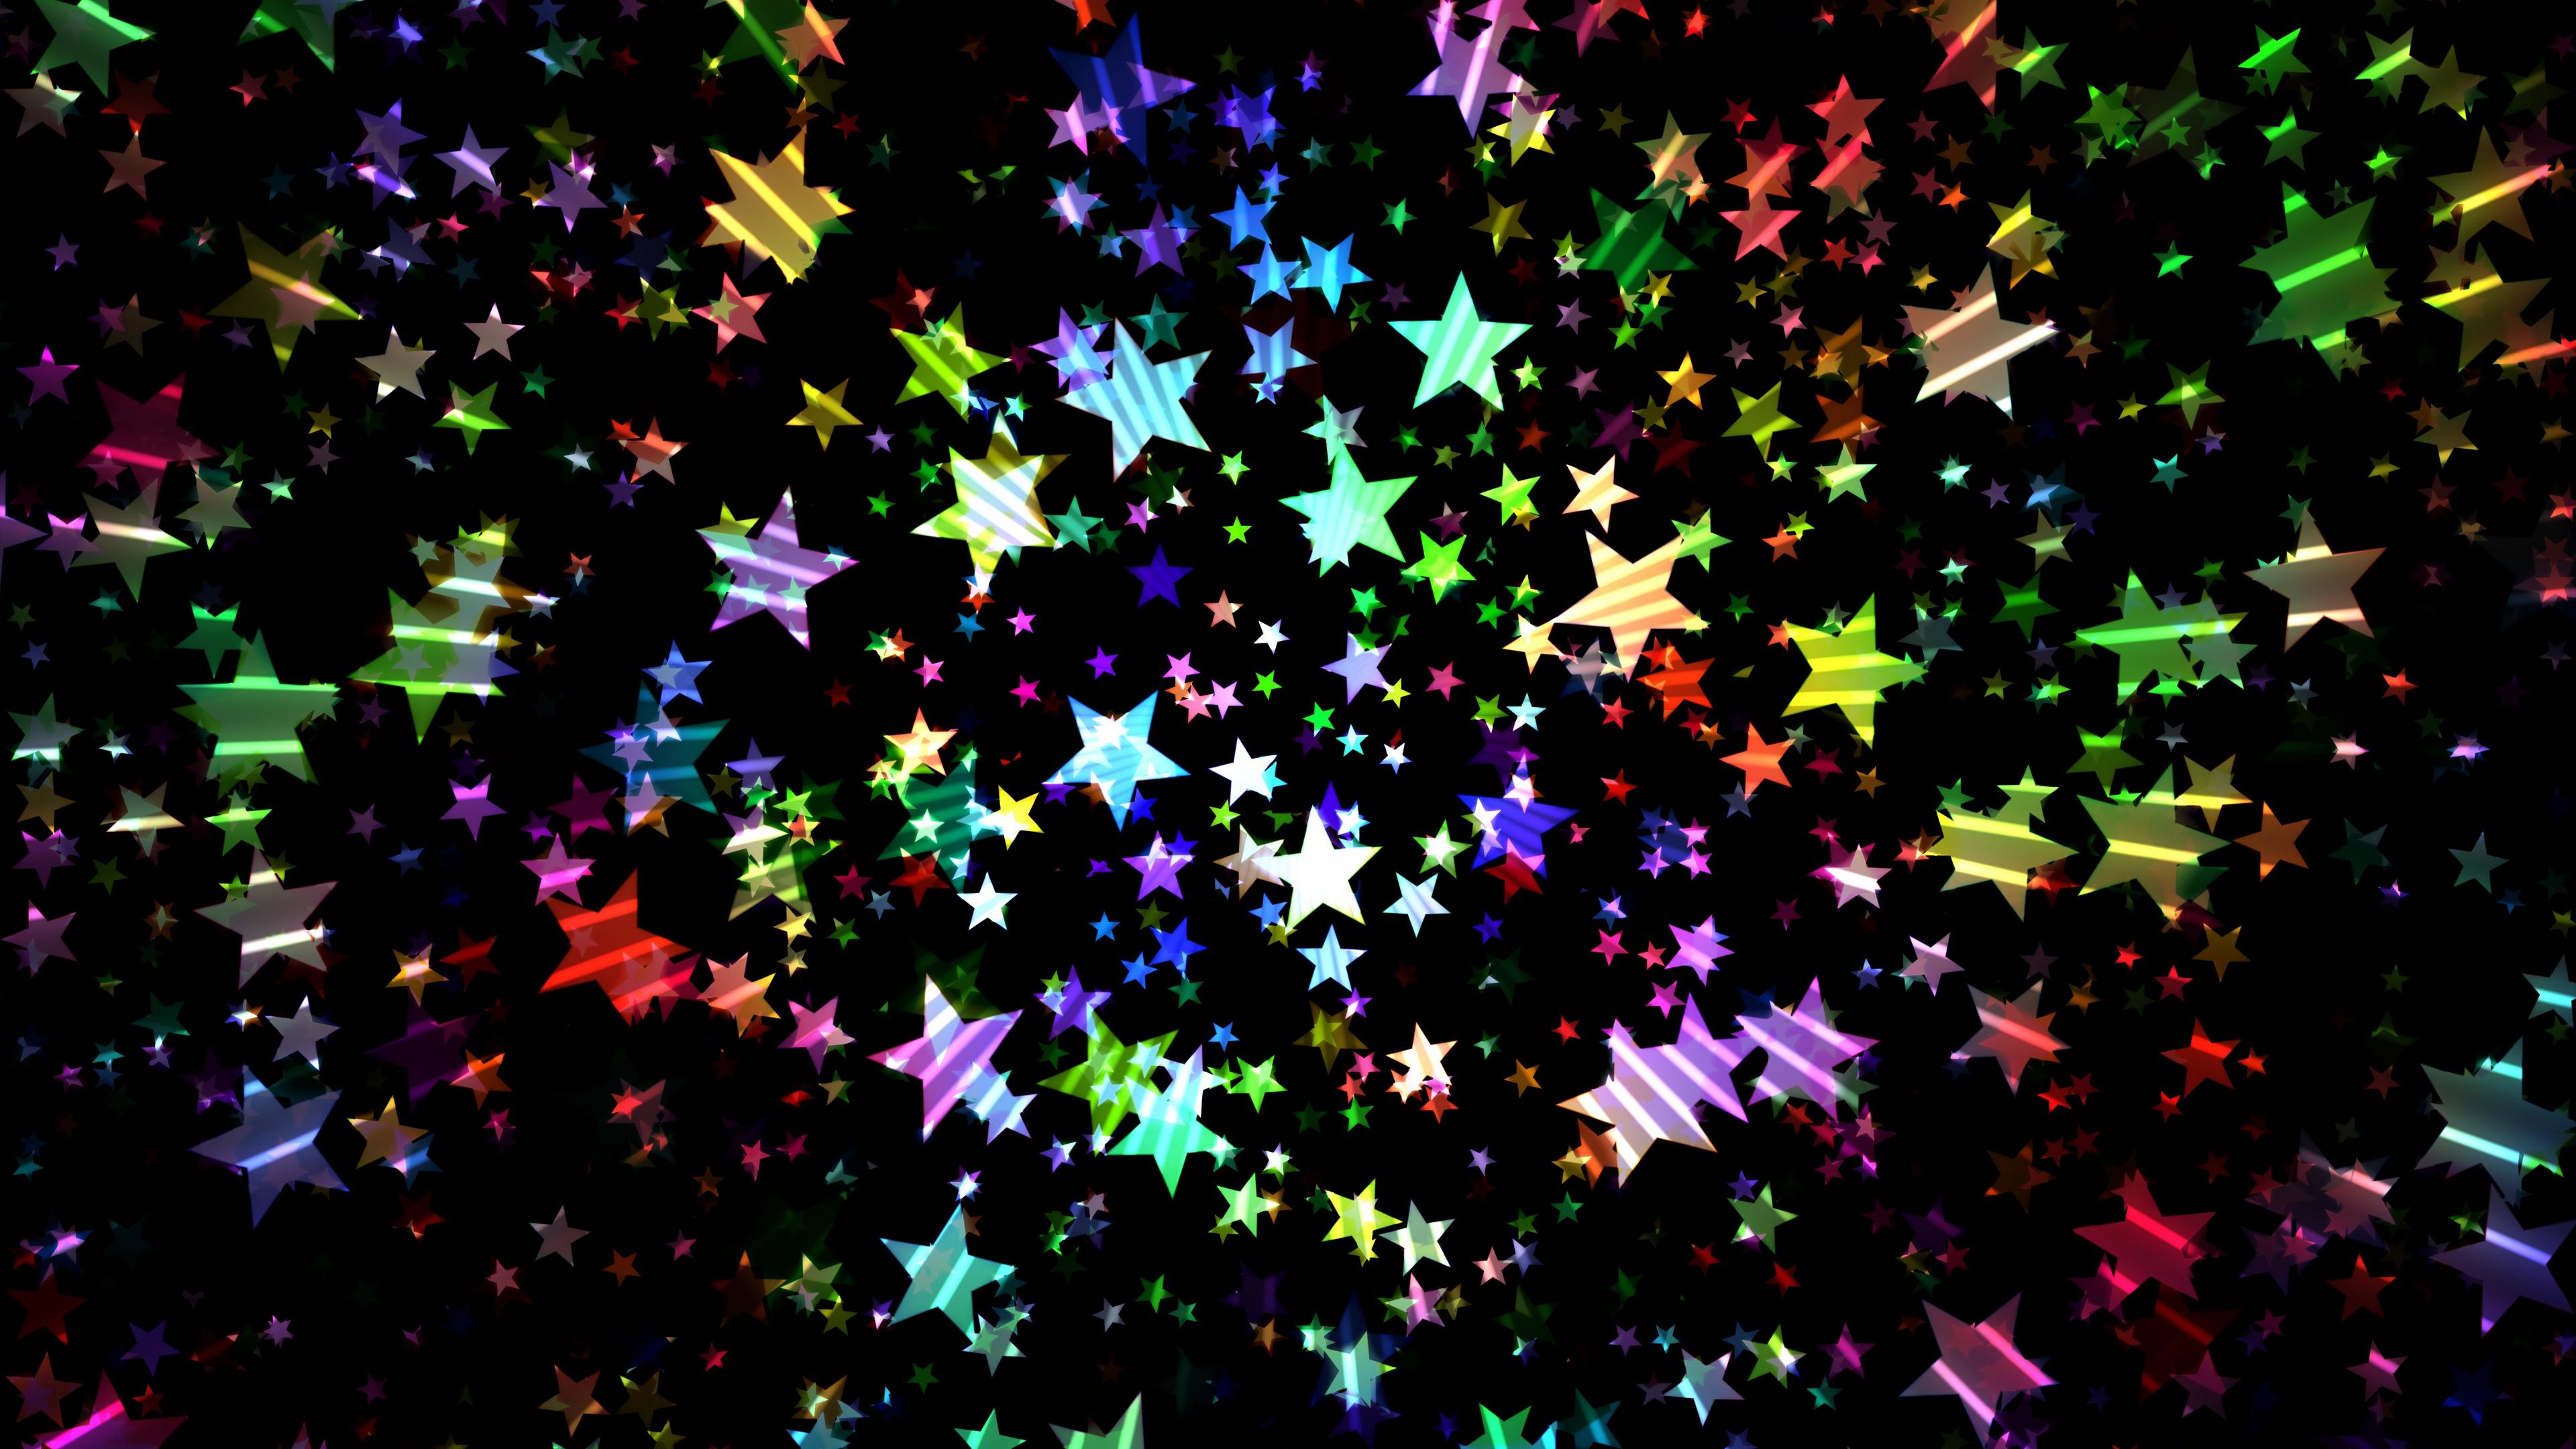 stars colorful shiny bright 4k 1539369990 - stars, colorful, shiny, bright 4k - Stars, shiny, Colorful